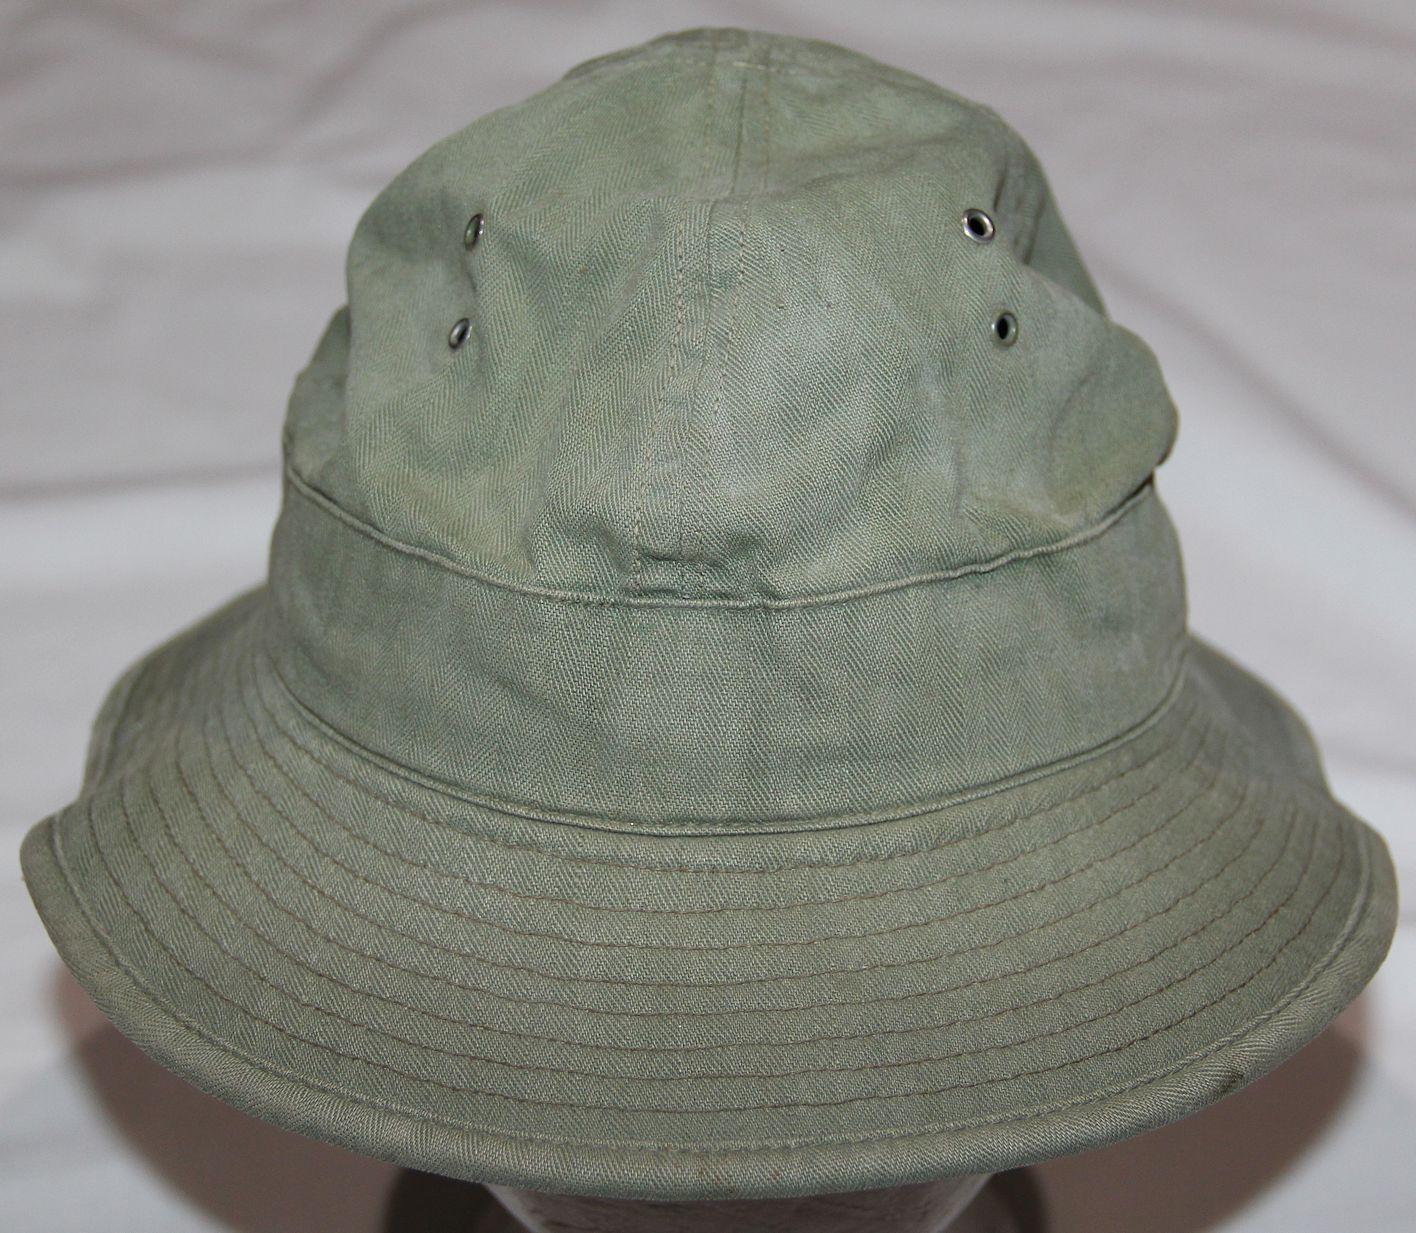 5a3c77bdf36 C028. EARLY WWII OD HBT DAISY MAE FATIGUE CAP - B   B Militaria